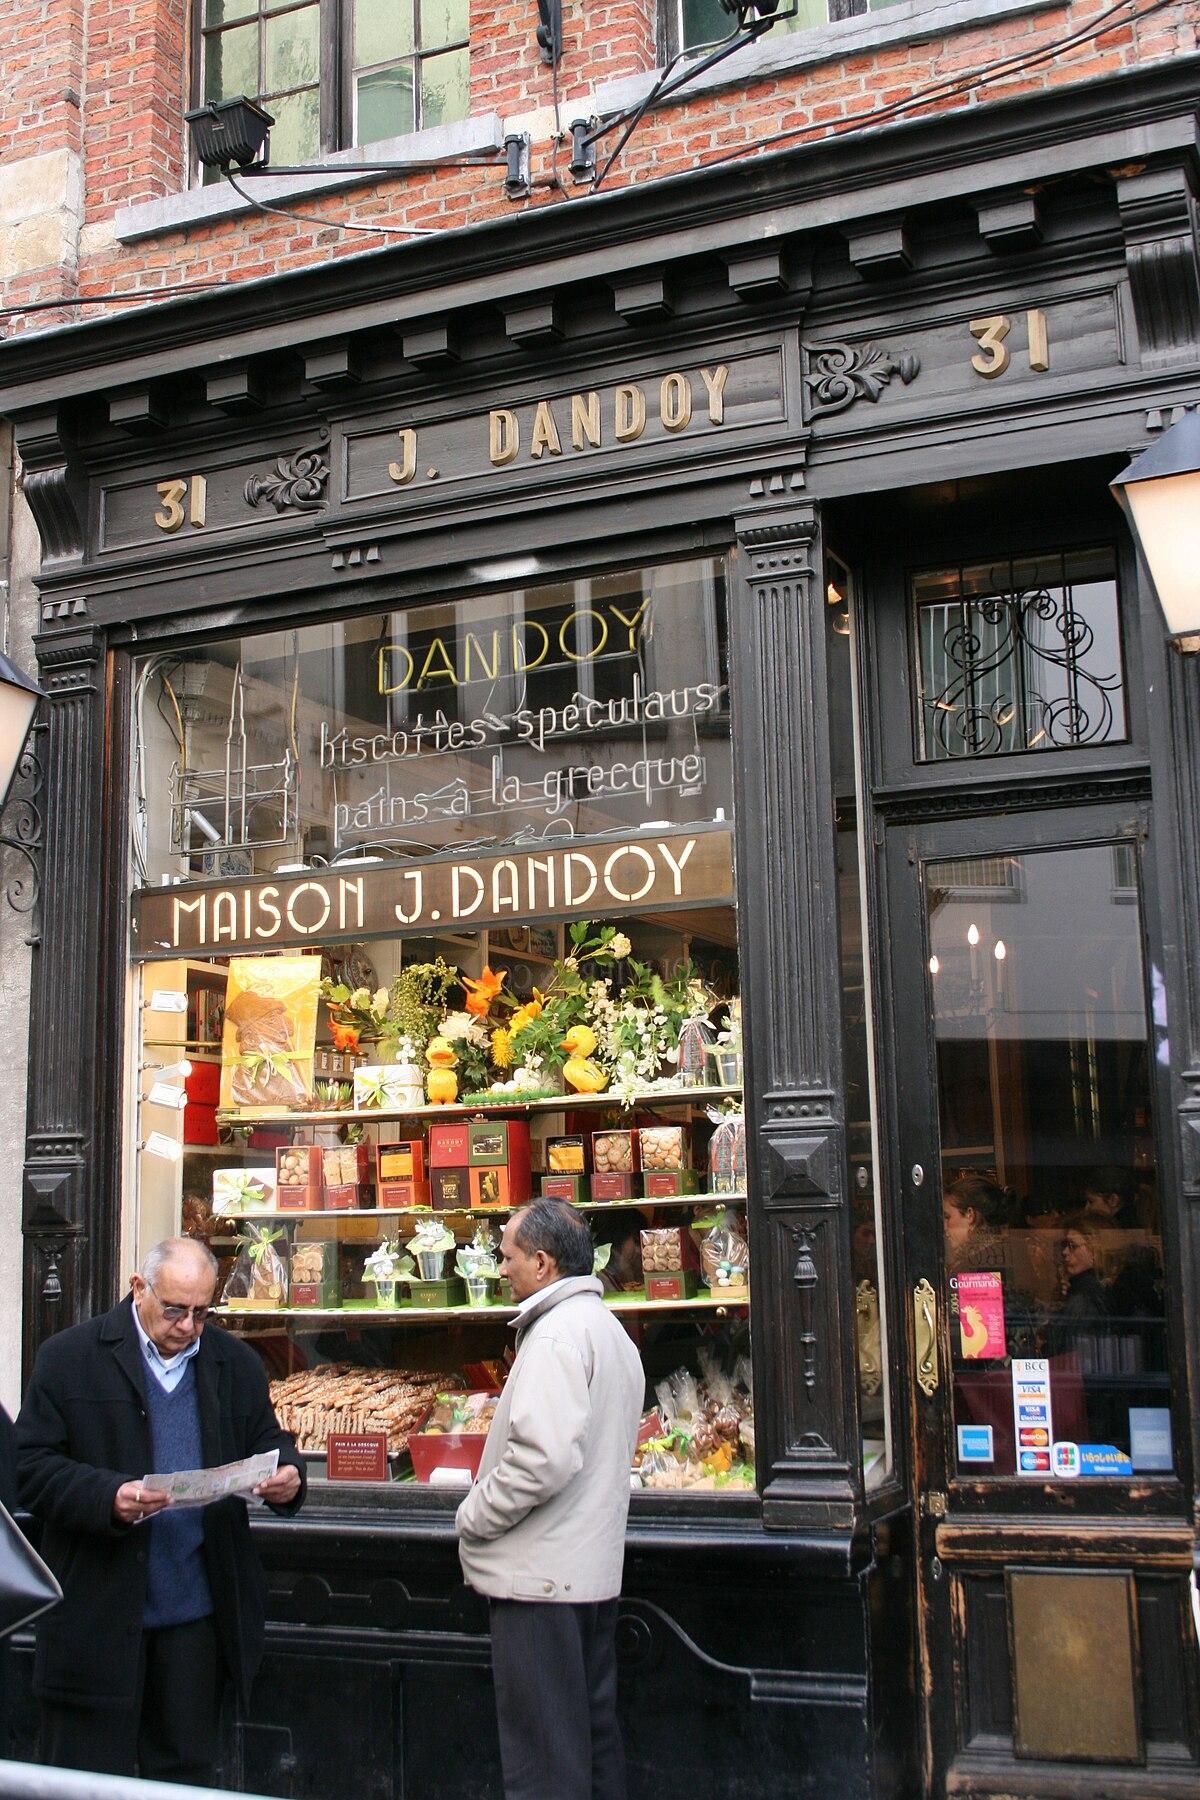 Bakery Wikipedia